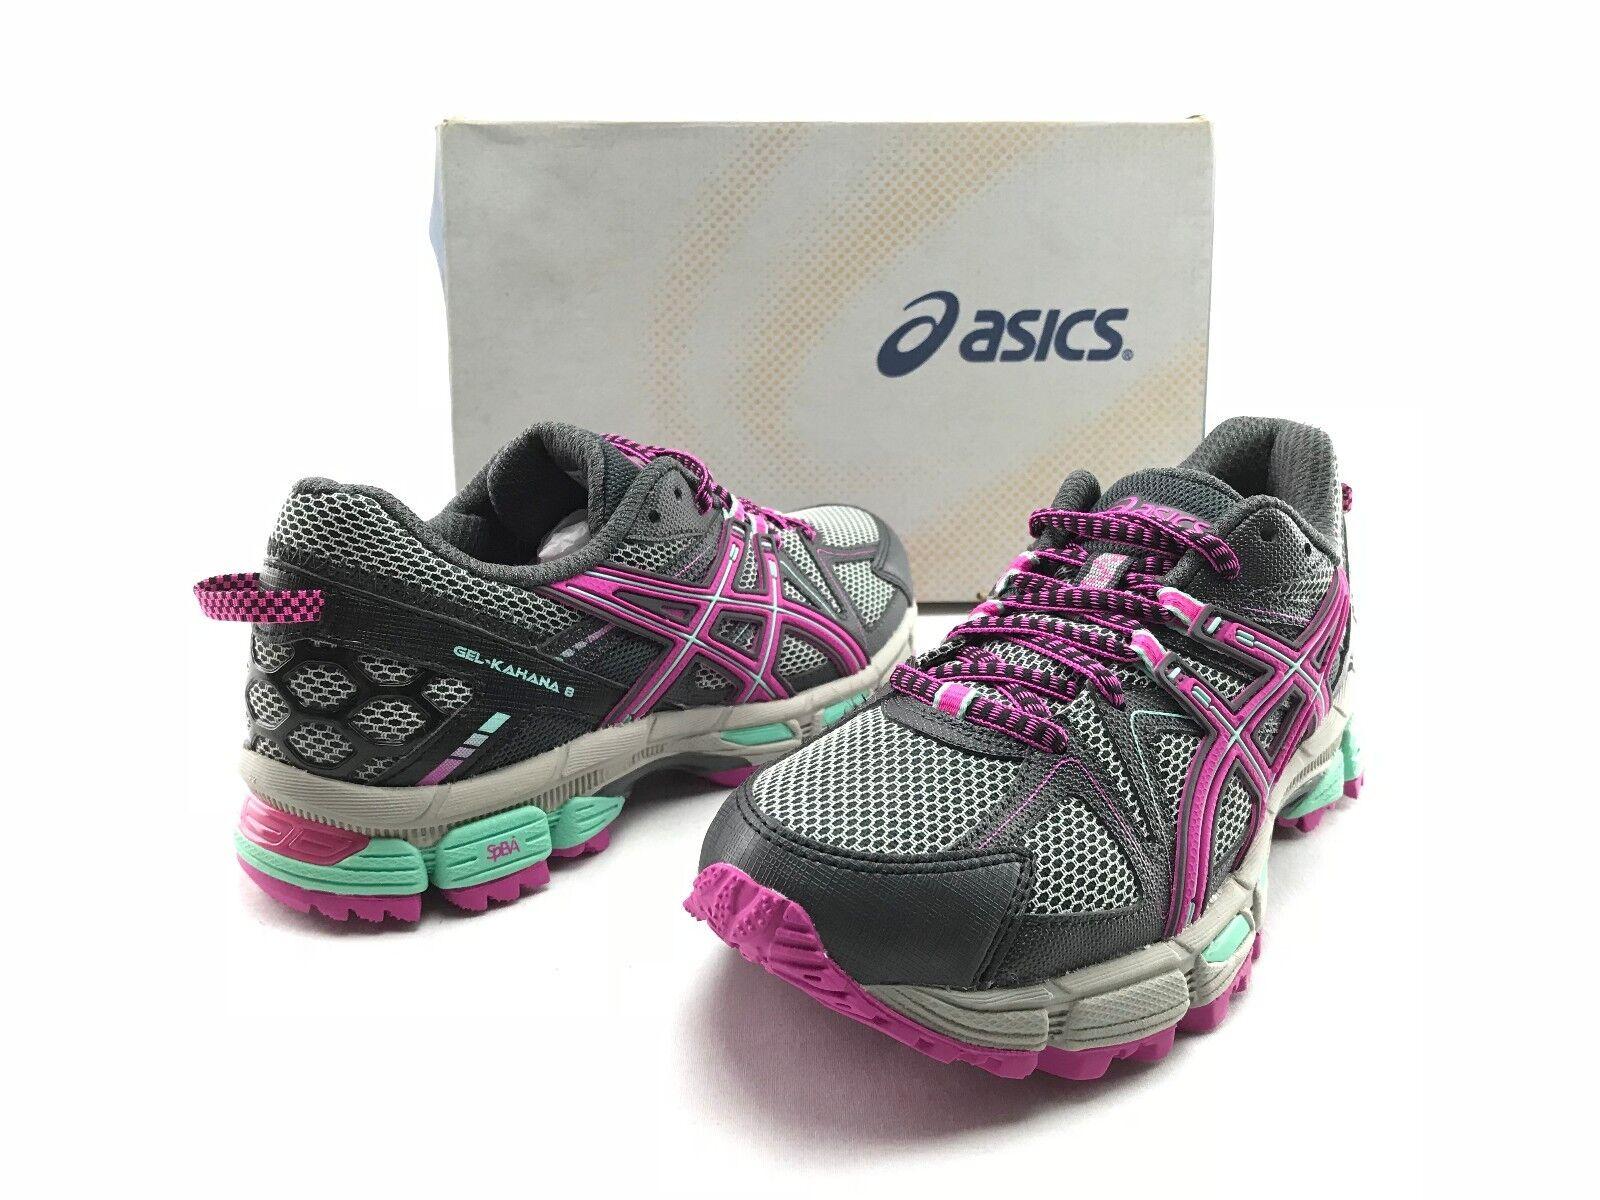 NEW Asics Gel Kahana 8 Wpomen's Purple Lace Up Running Training Shoes US 6 B427 Cheap and beautiful fashion